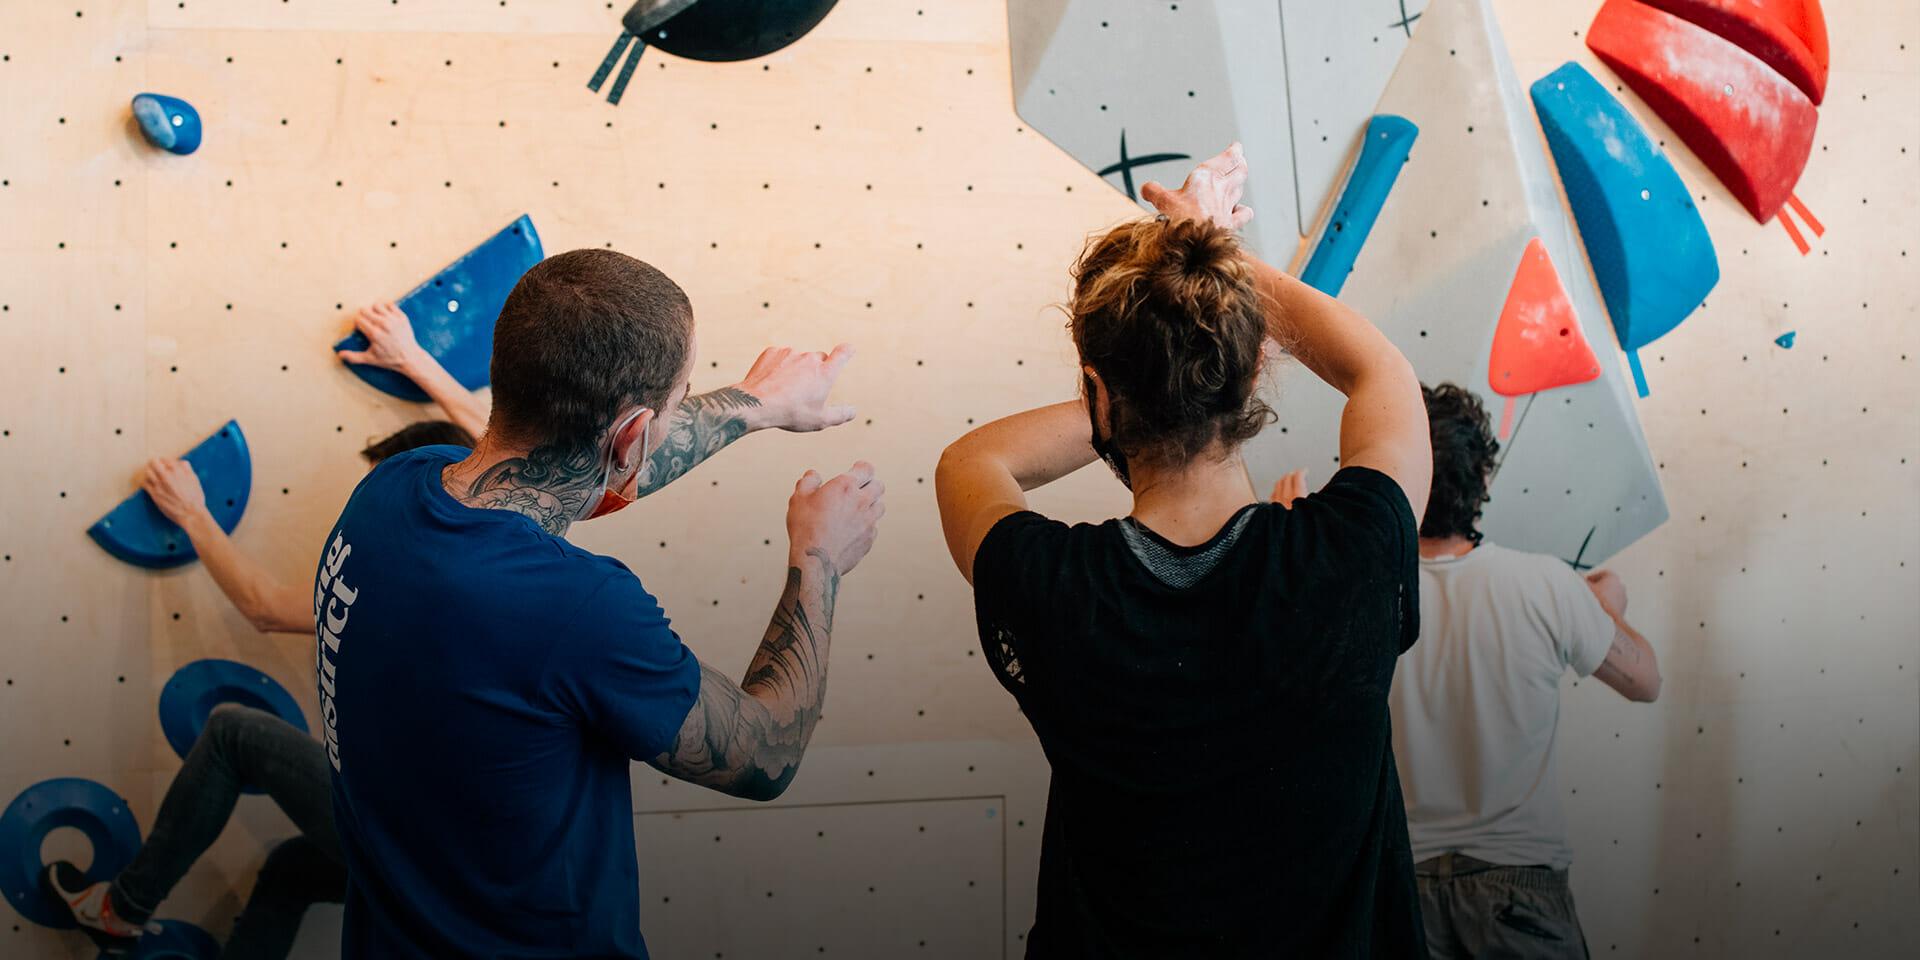 Coaching, entraînements d'escalade à Climbing Ditsrict